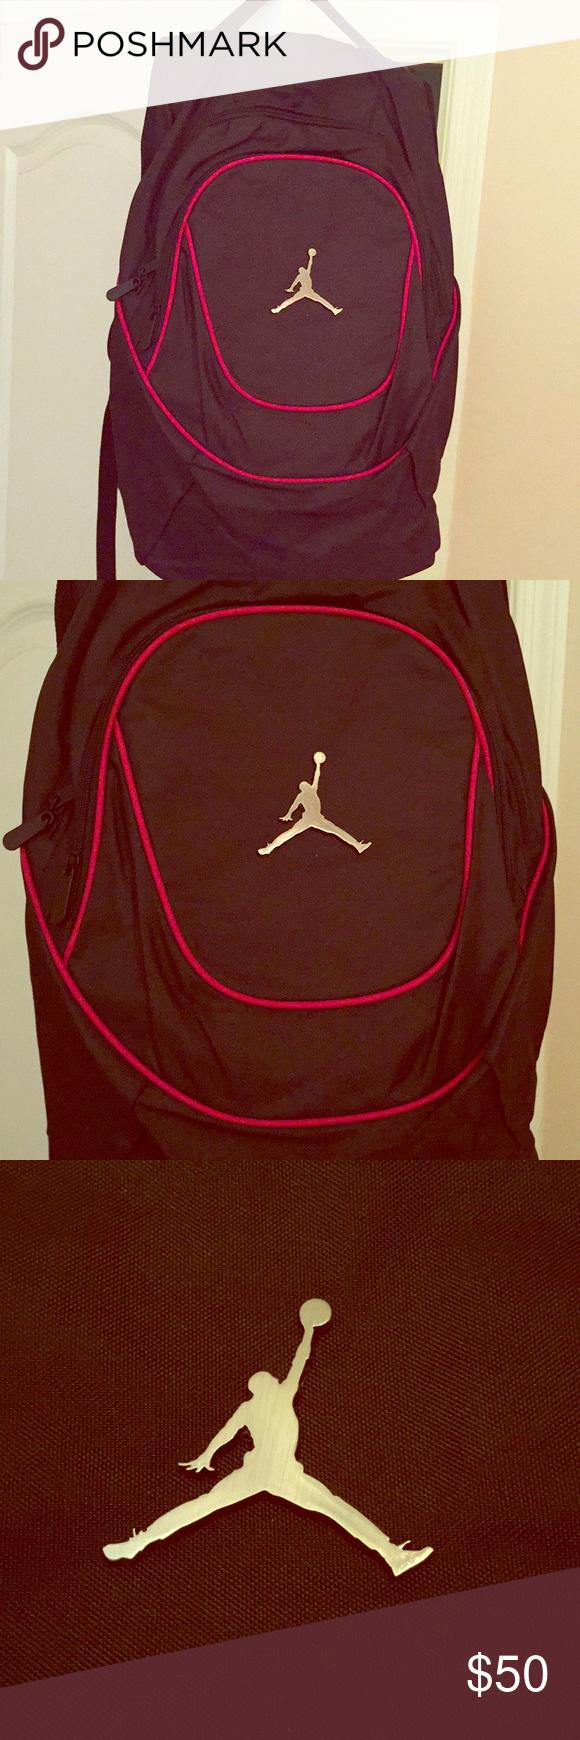 2f00de279b92 Jordan Backpack 🏀 Authentic Jordan Backpack. Unisex. OS.